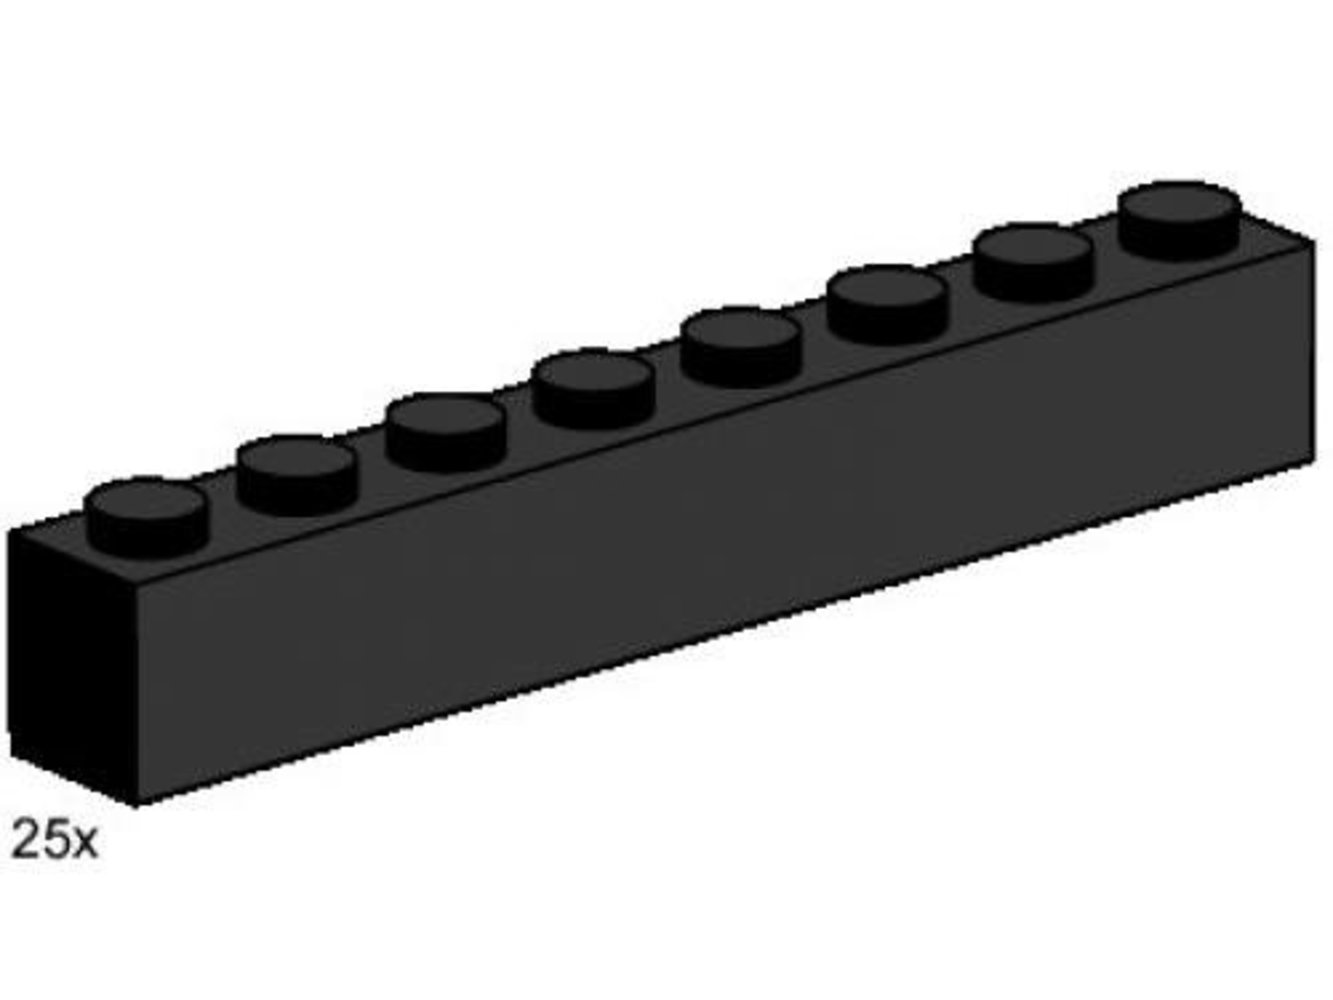 1 x 8 Black Bricks